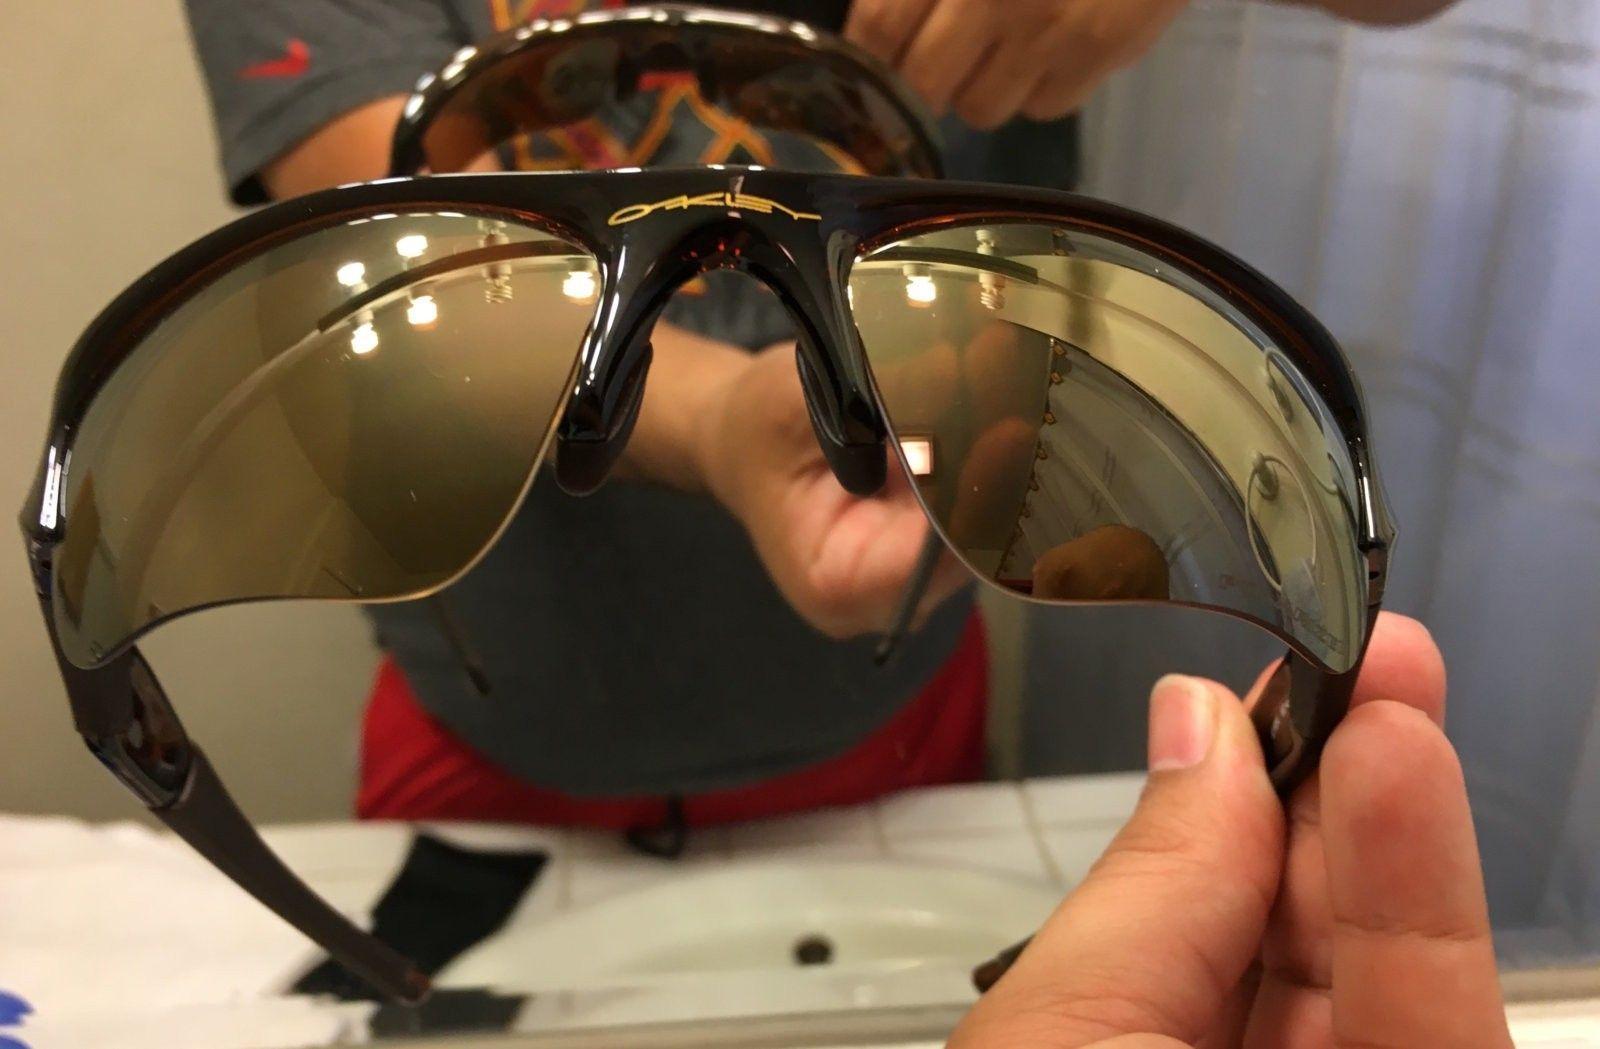 Flak Jacket 1.0 - 2 pairs - Polarized lenses - 2016-07-07 19.24.32.jpg